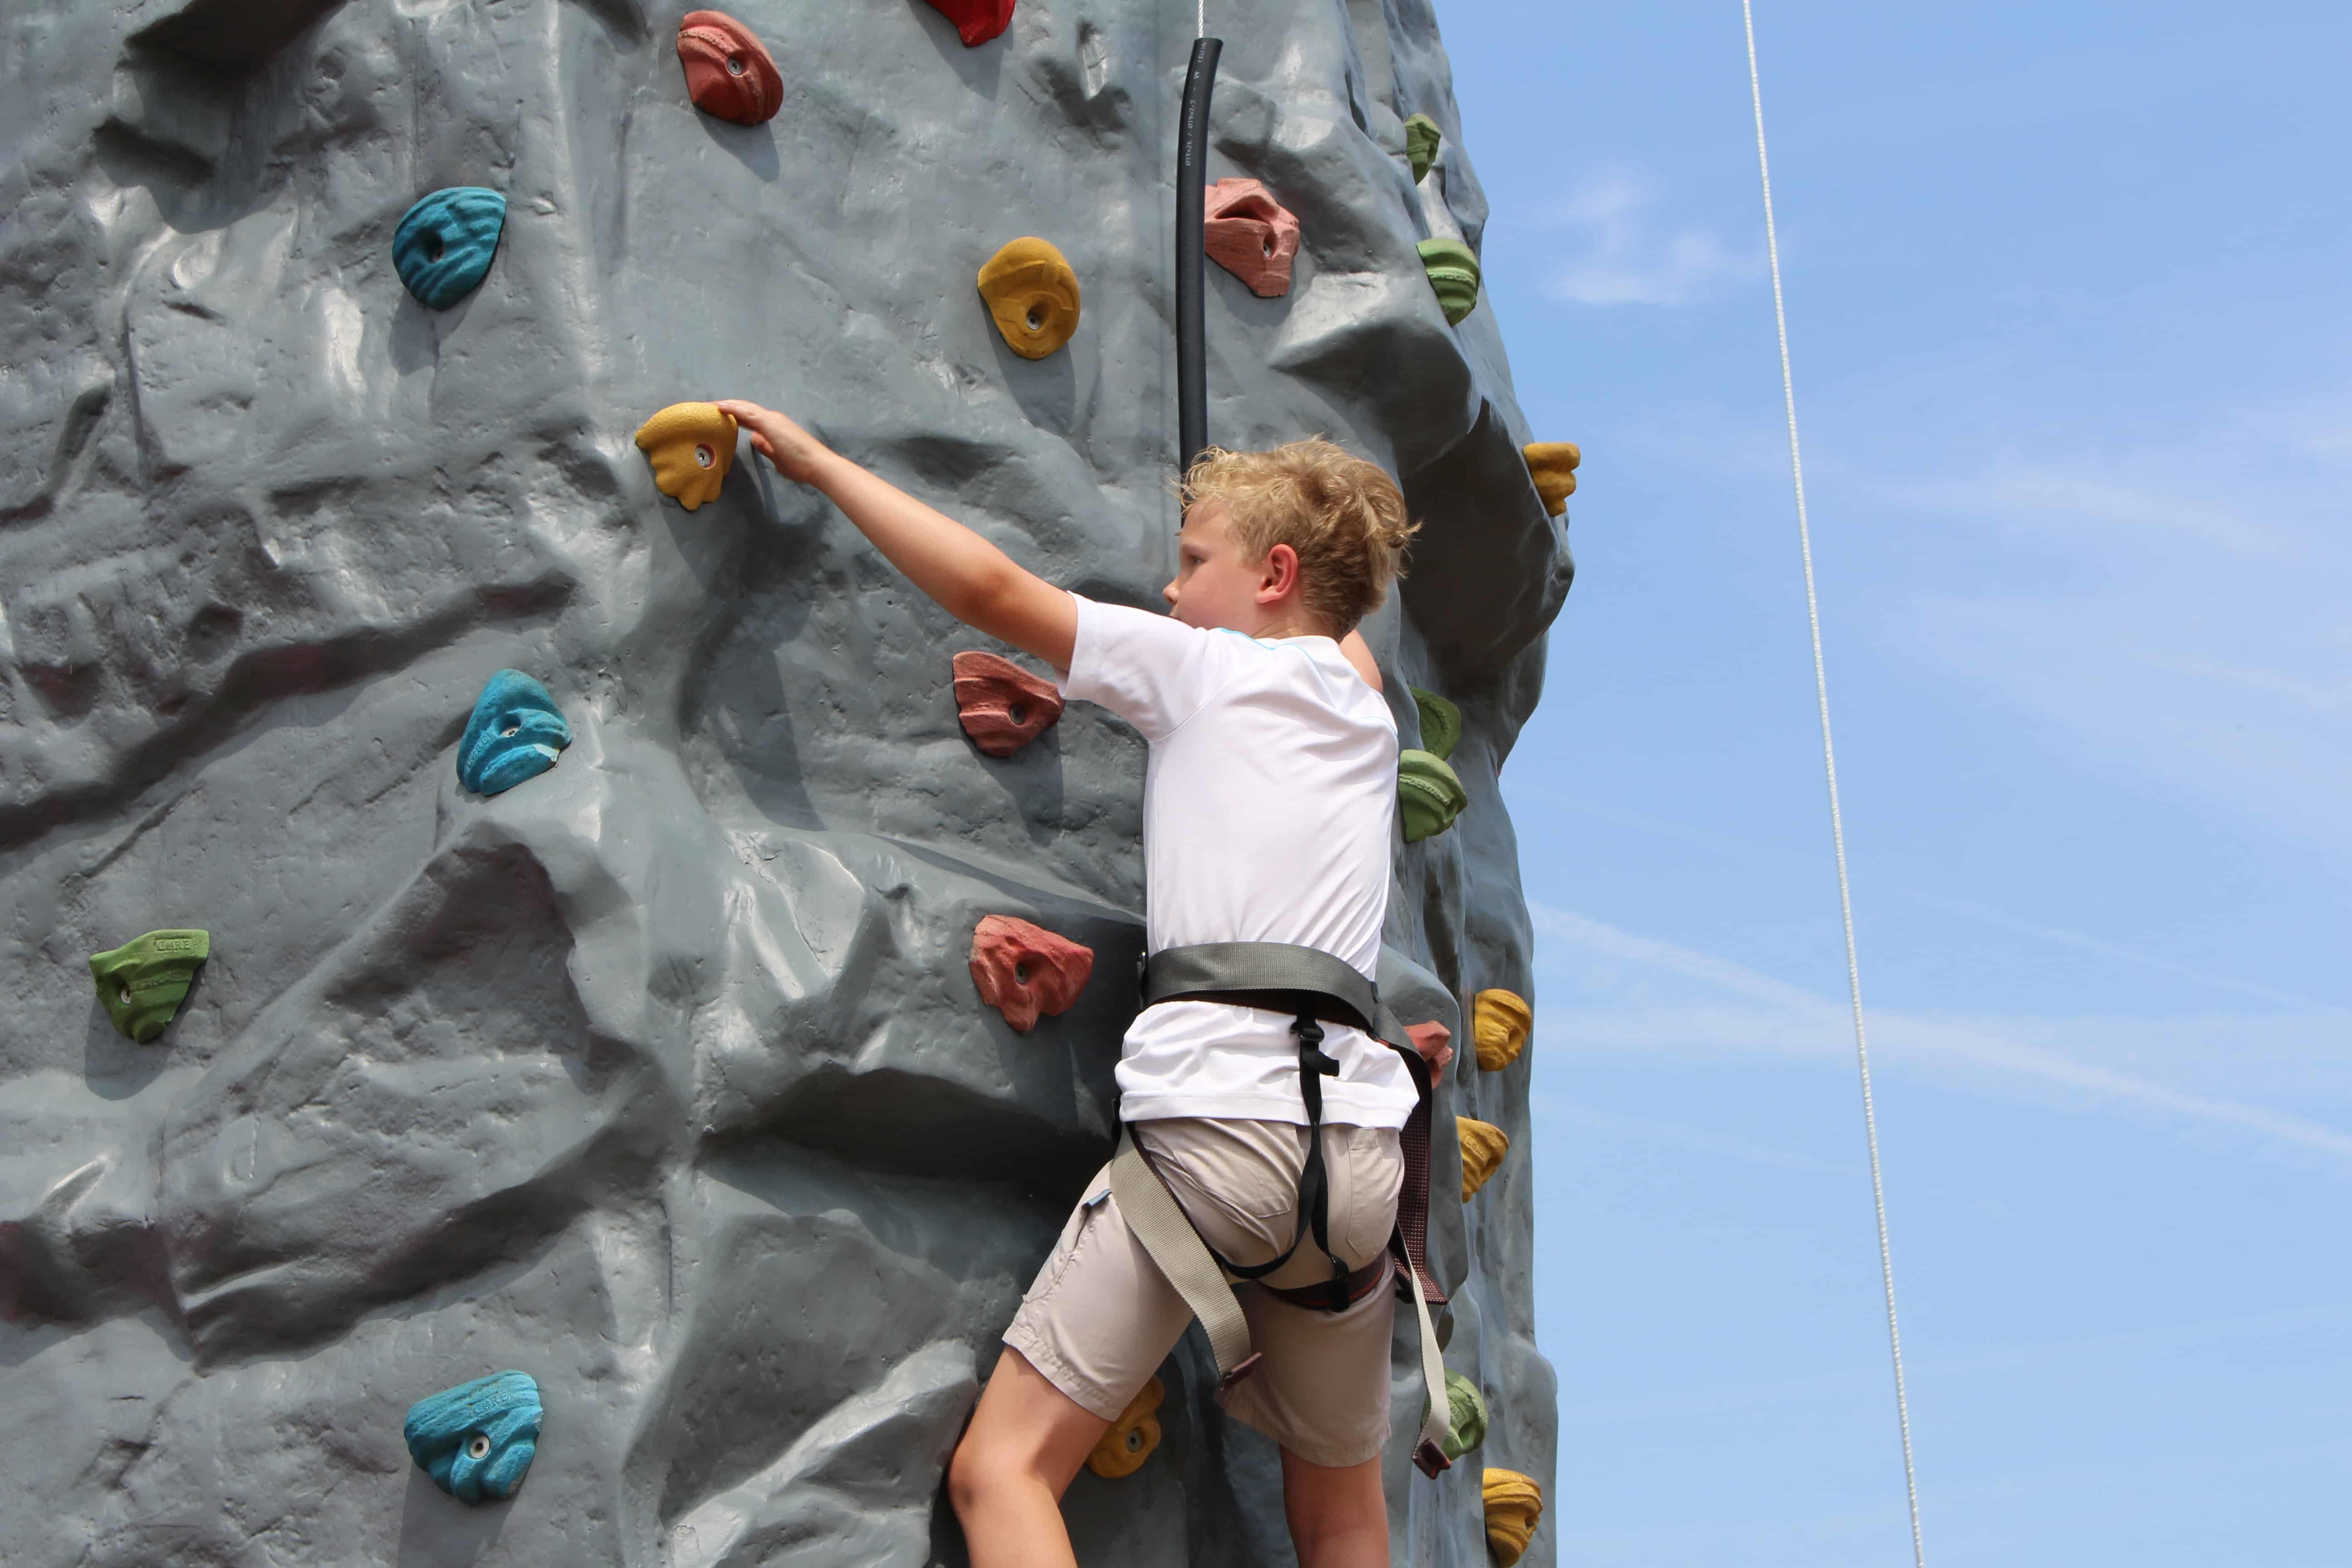 Mobile Rock Climbing Wall Hire London South East Uk